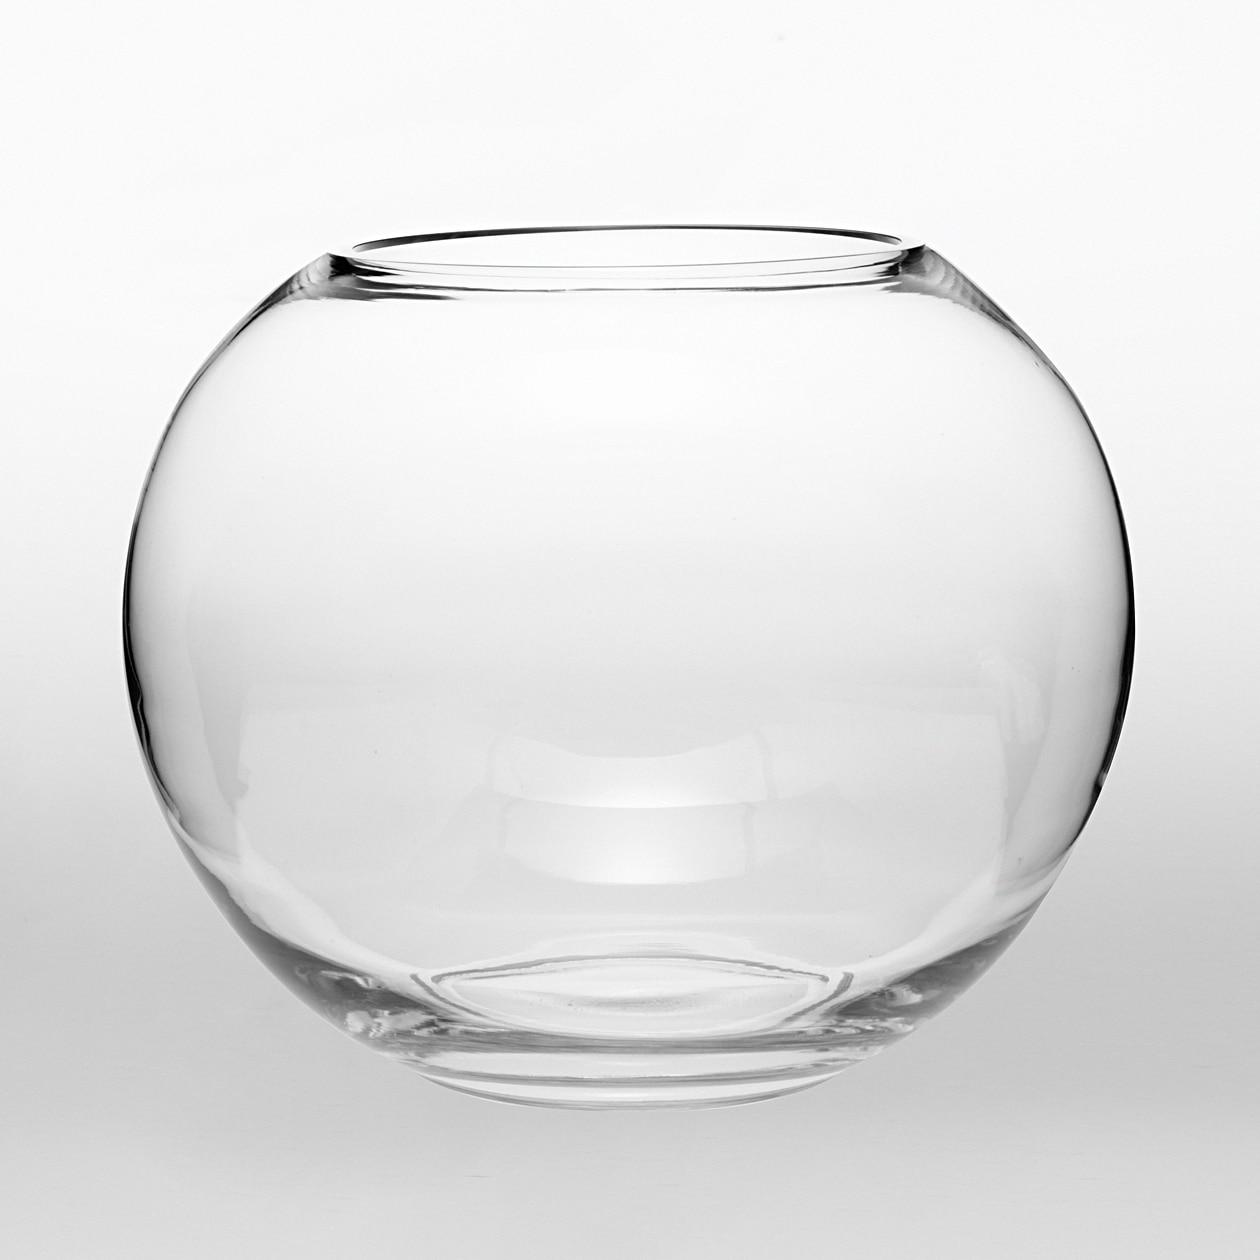 RoomClip商品情報 - ガラスフラワーベース ラージボール